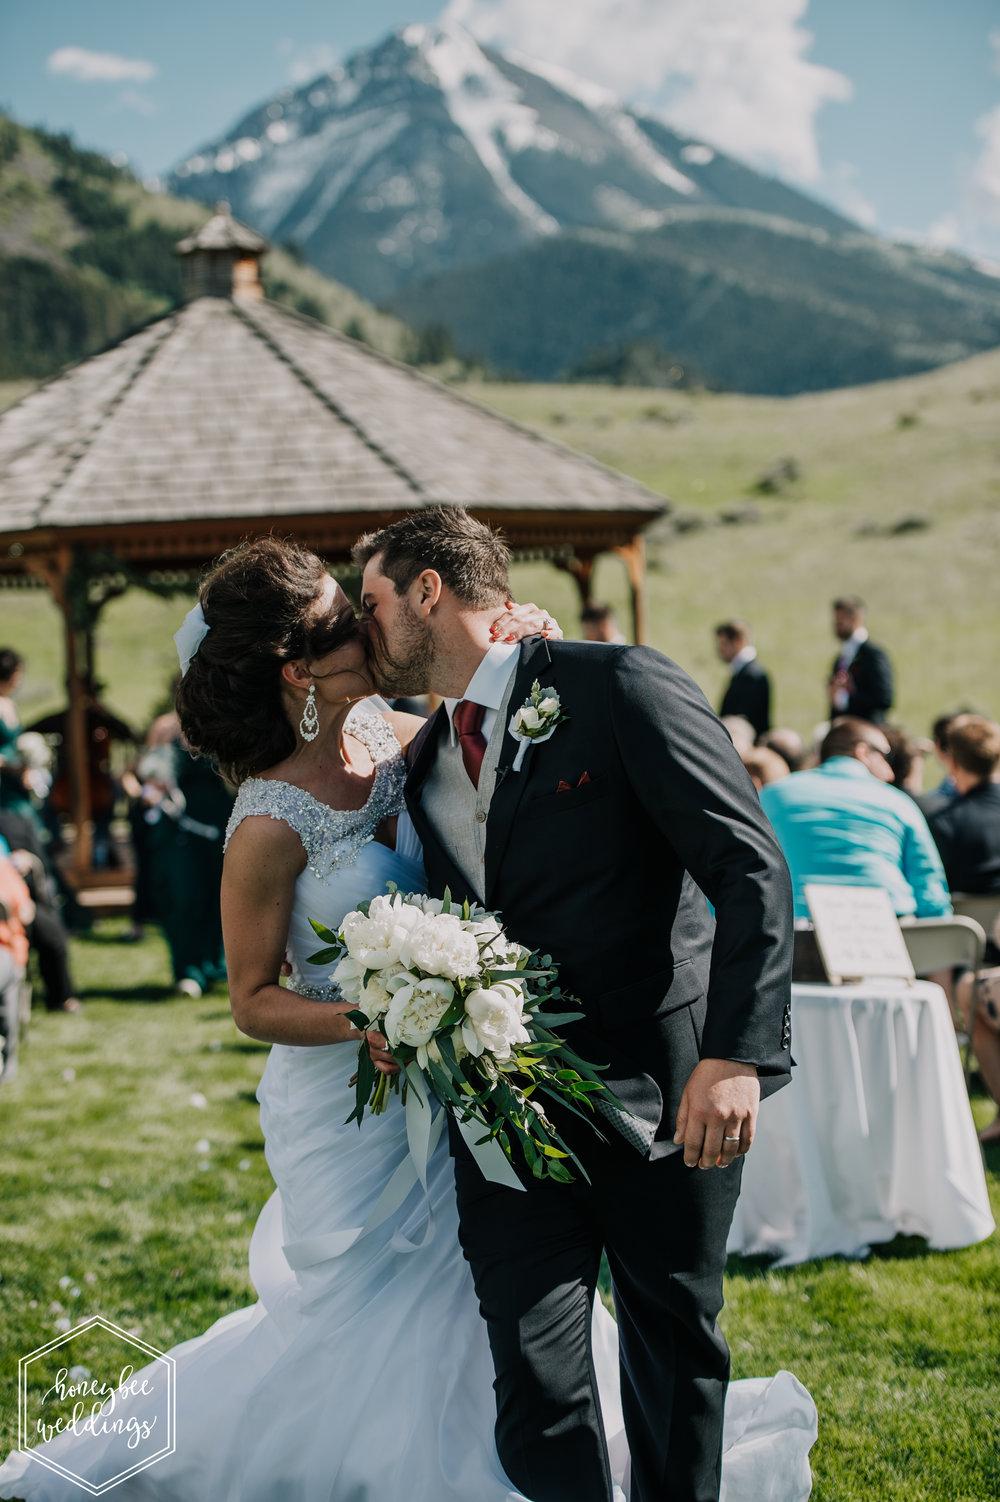 121 Chico Hotsprings Wedding_Bowdino 2018-3656-2.jpg